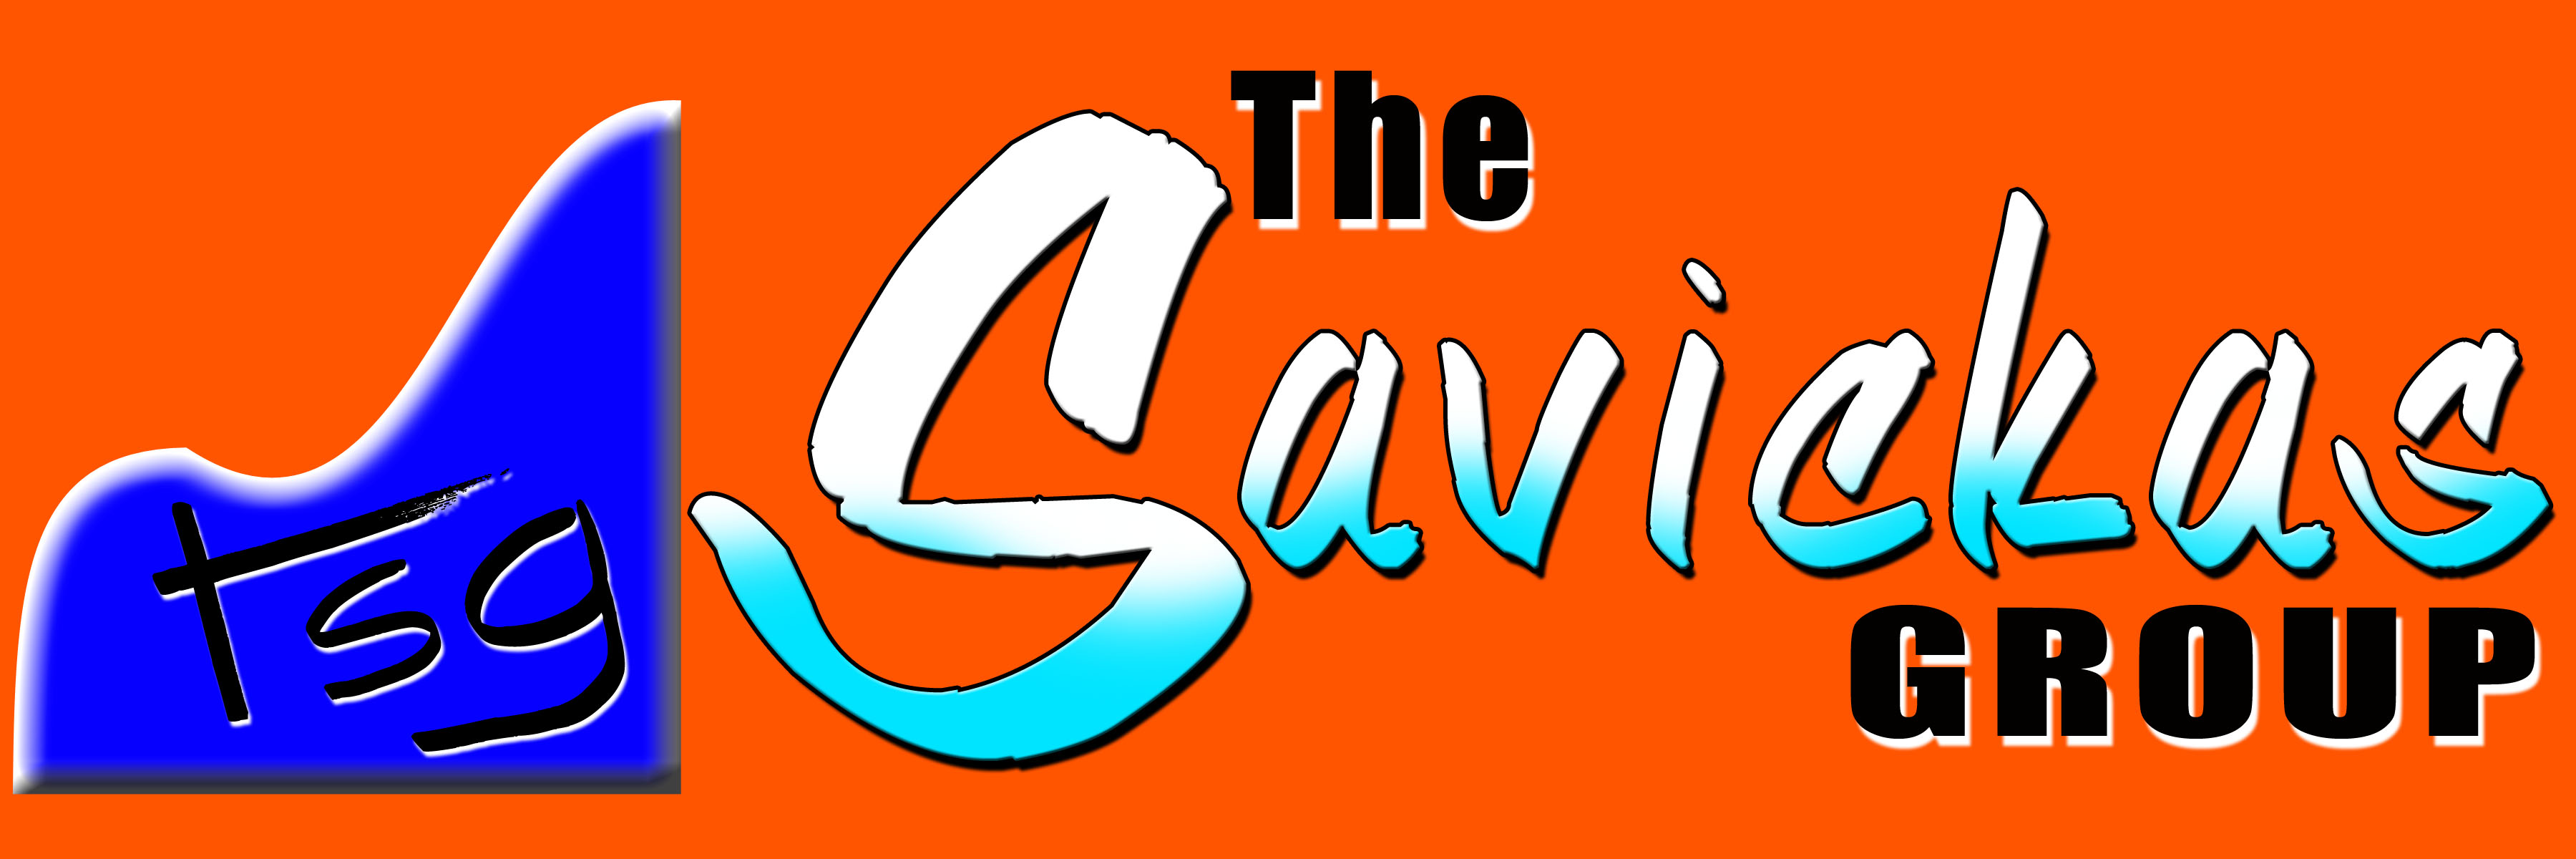 Logo Design by Davy Jones Estrellanes - Entry No. 65 in the Logo Design Contest Logo Design Needed for Exciting New Company The Savickas Group.